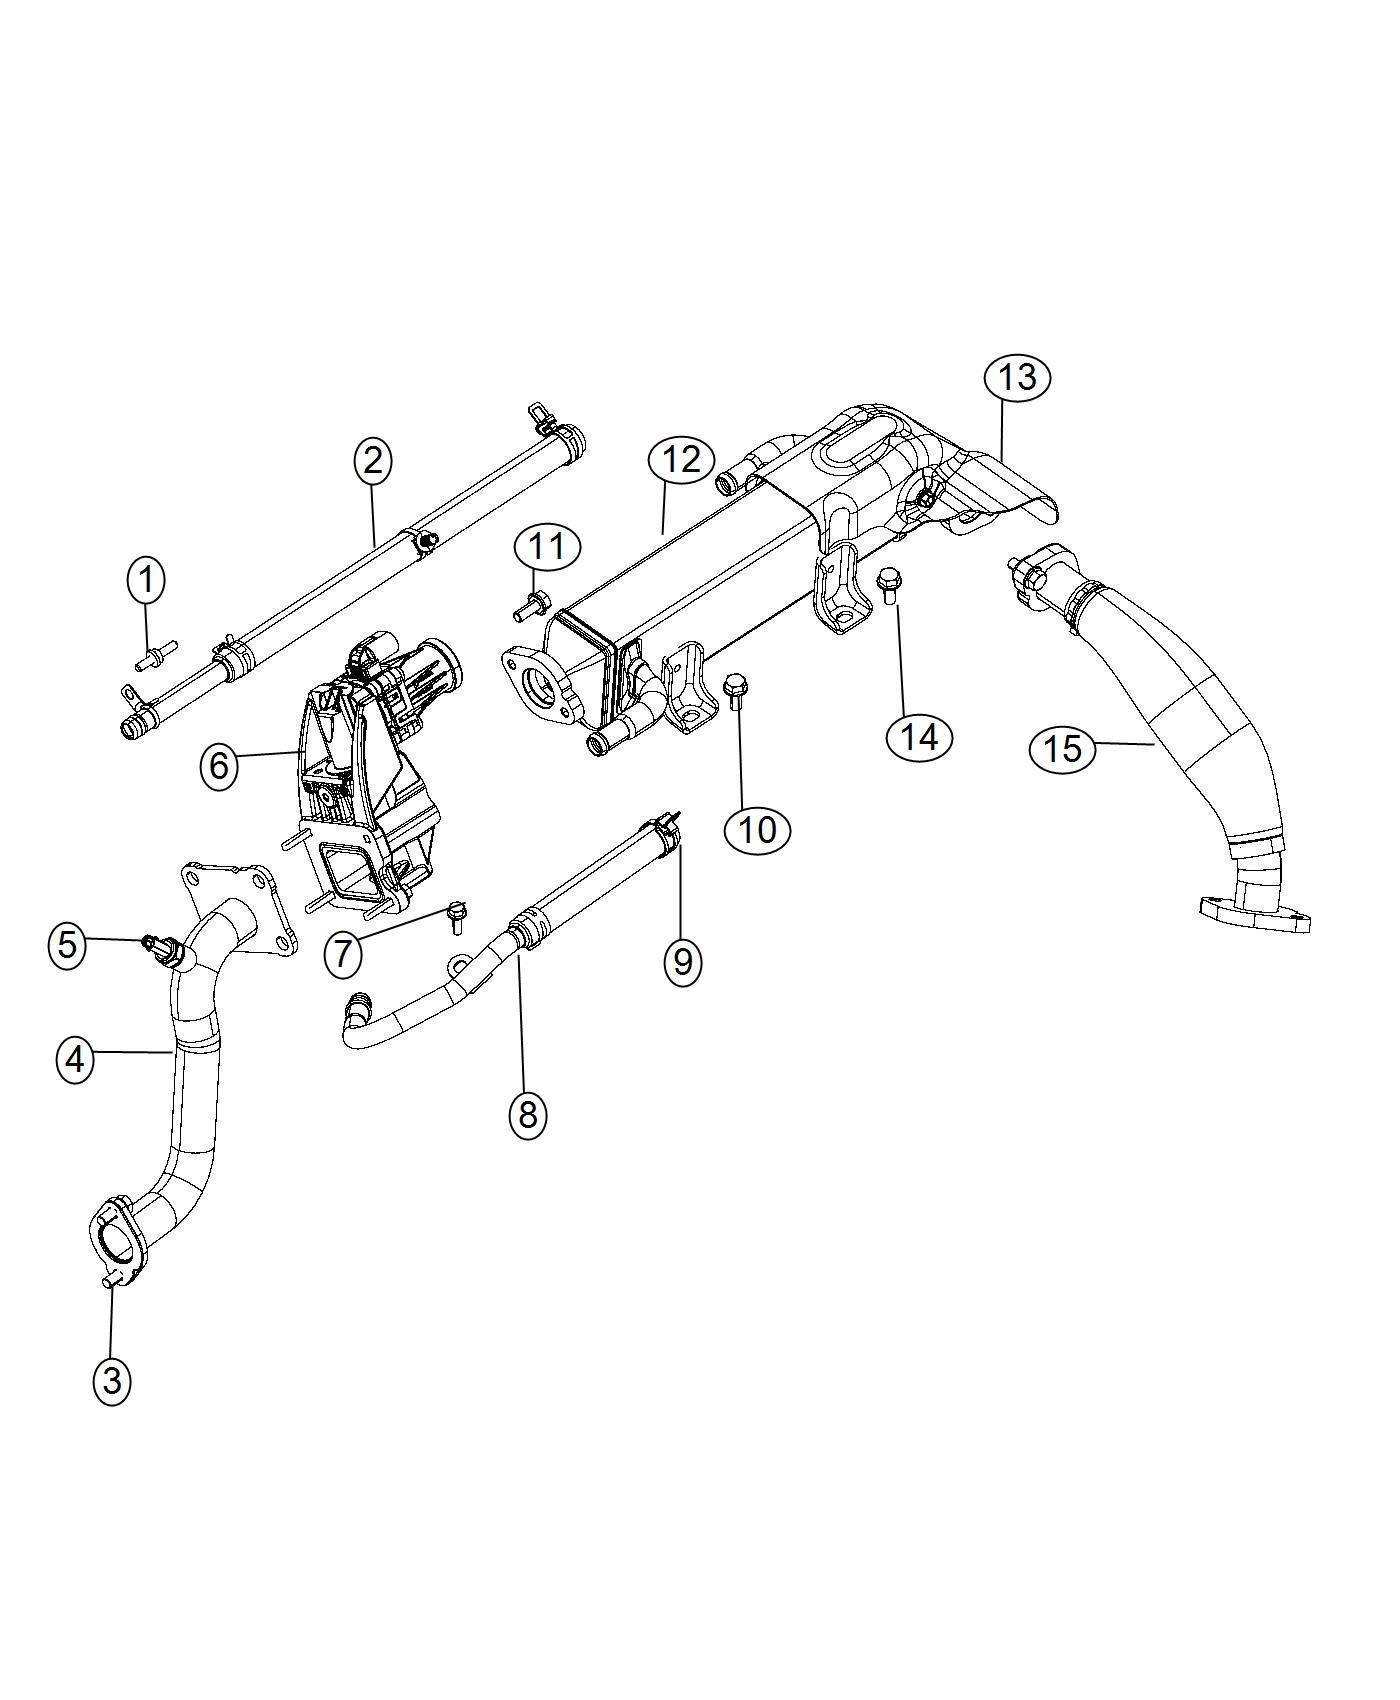 Ram Screw Hex Head M8x1 25x21 Cooling